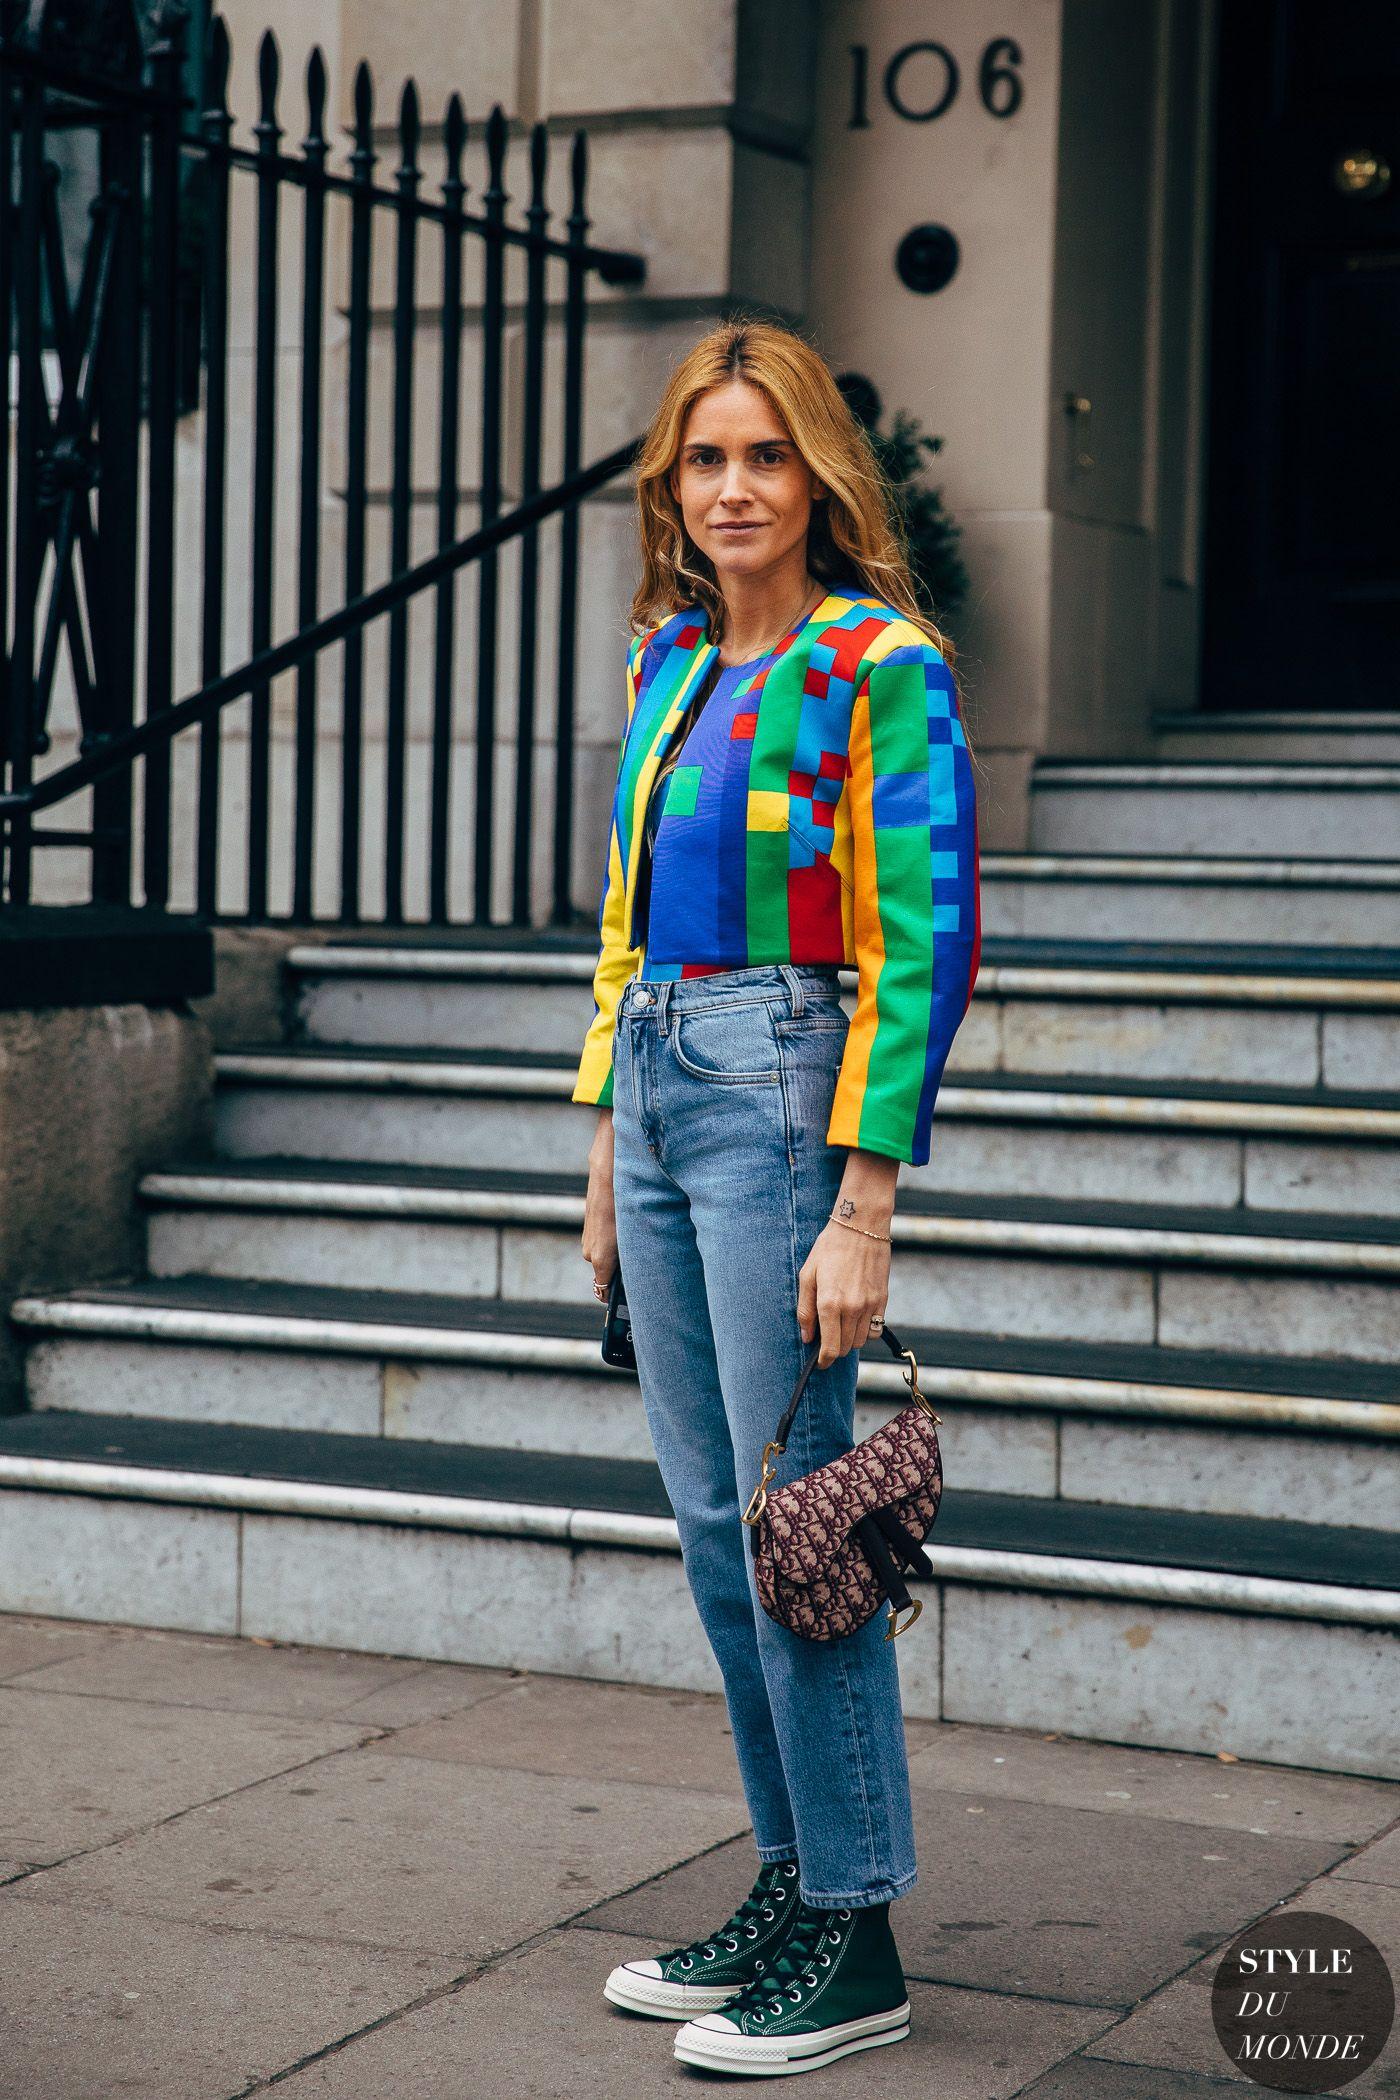 London FW 2019 Street Style: Blanca Miro